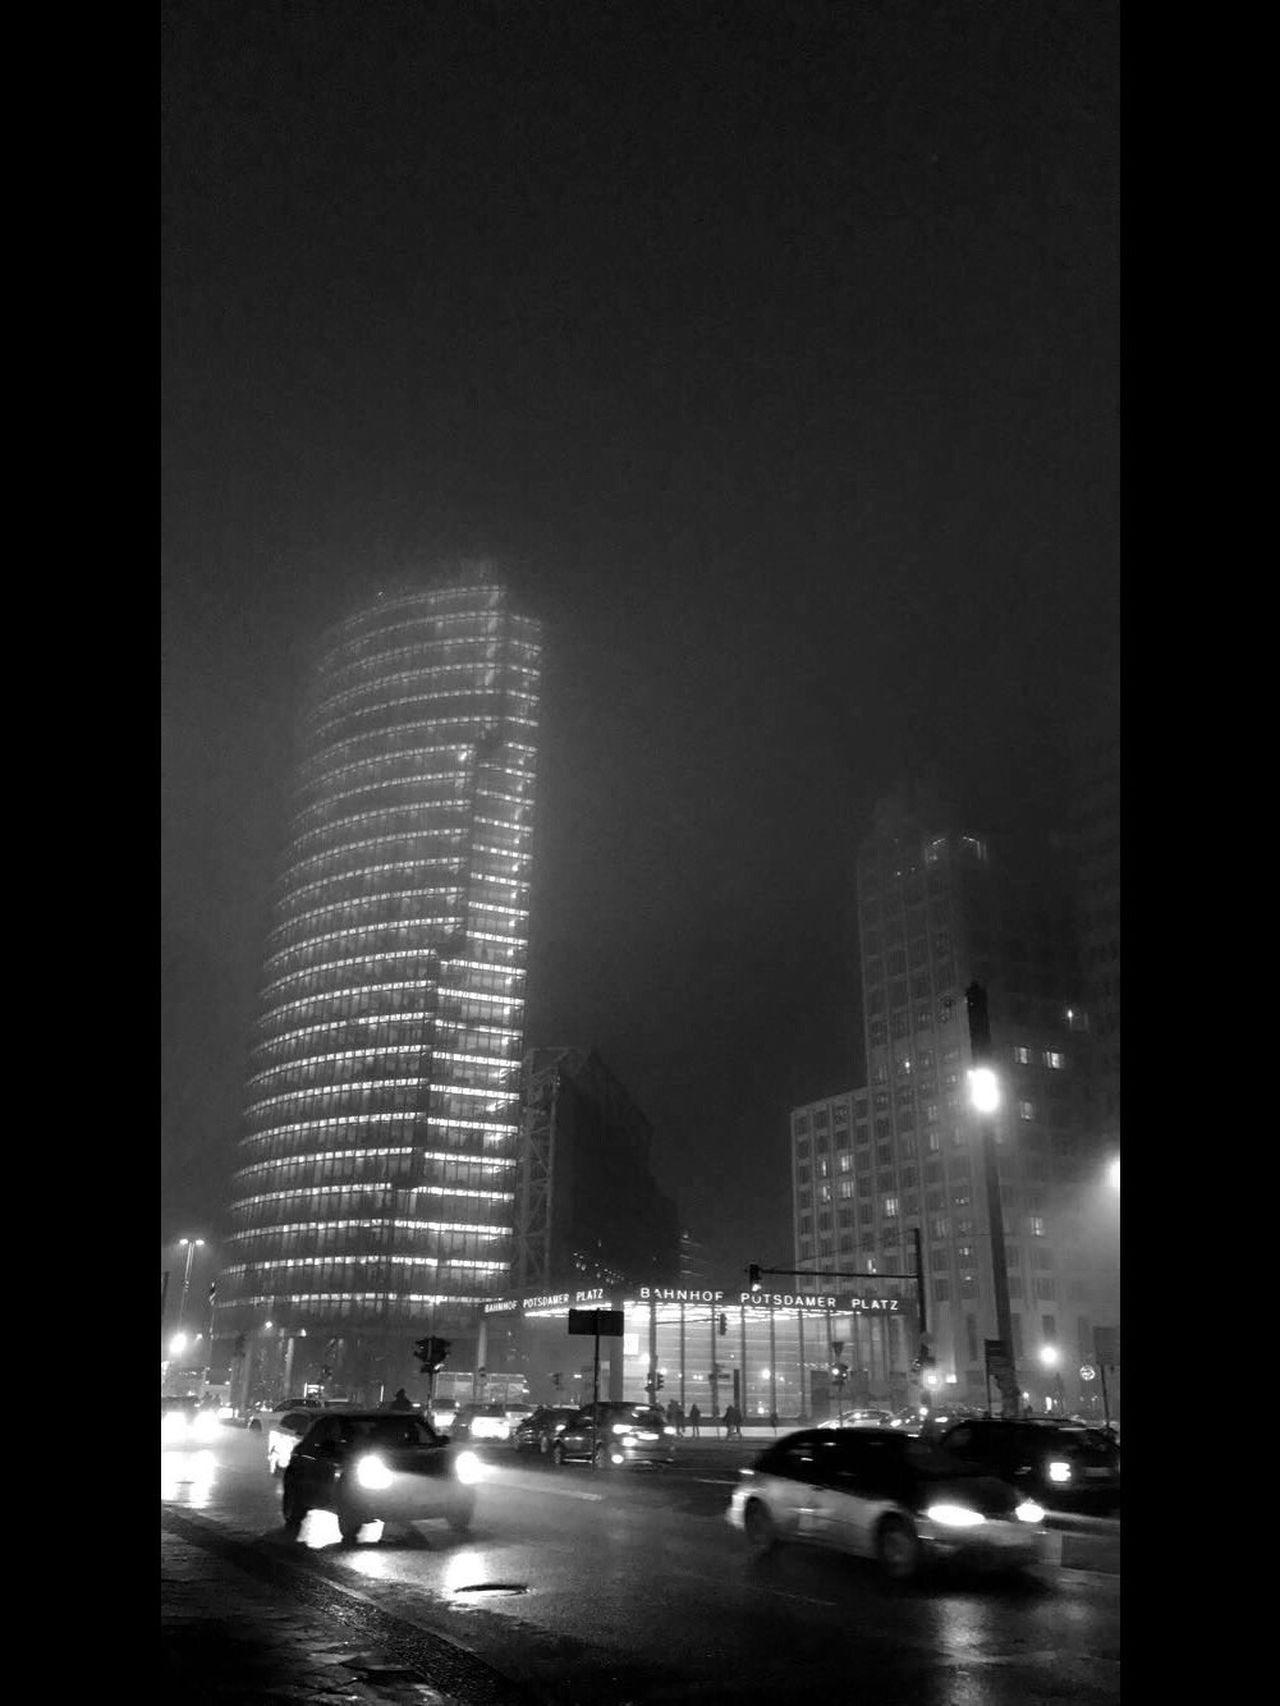 Streetphotography Blackandwhite Fog Lights Urban City Traffic Architecture Skyscraper Typography Berlin